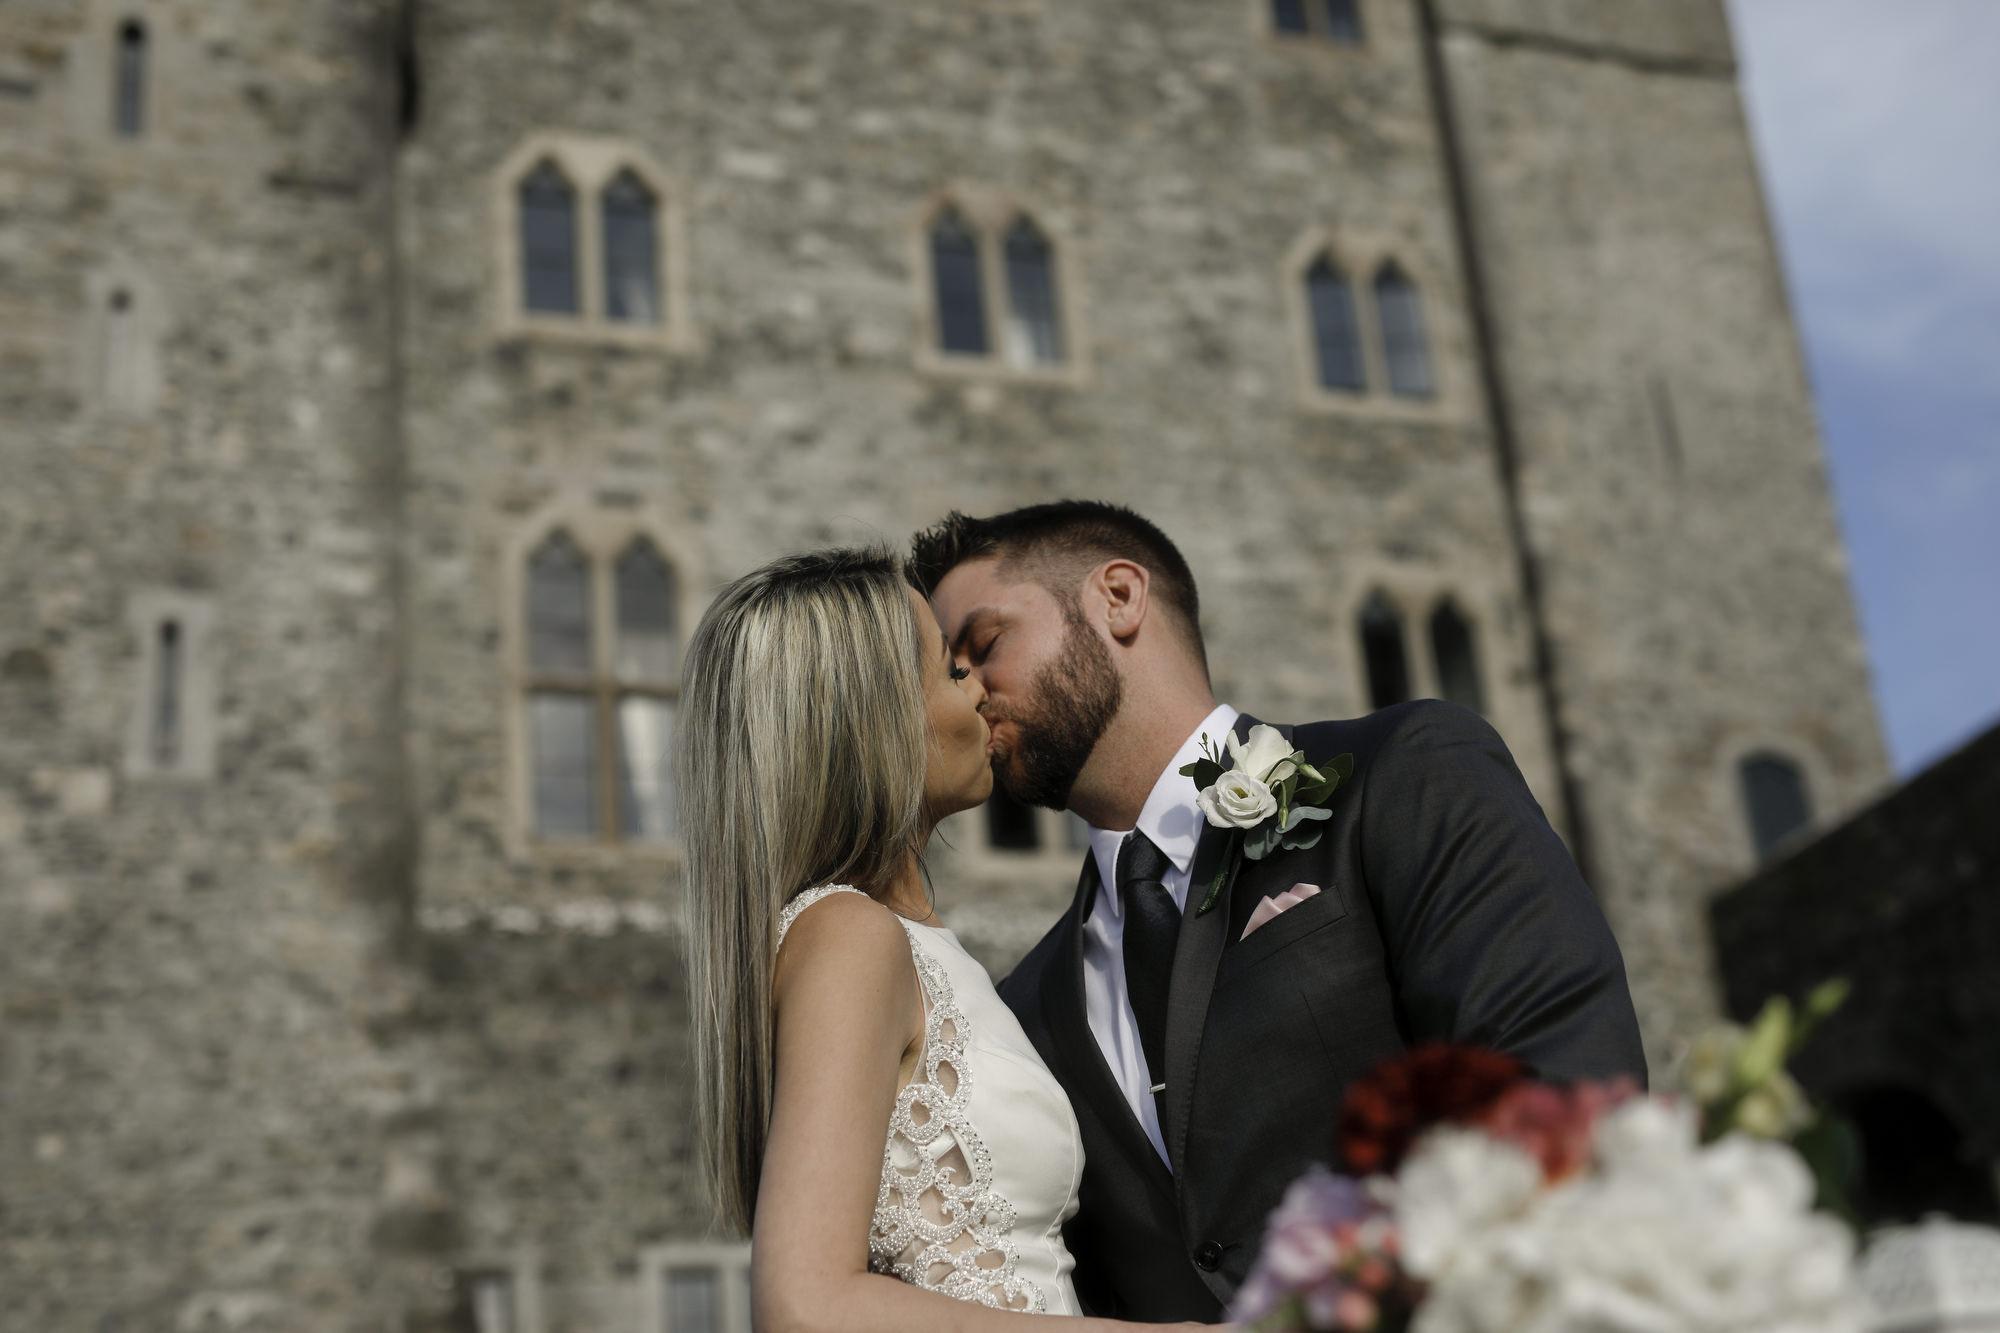 kilkea_castle_wedding_photographer_goldenmoments_032.jpg